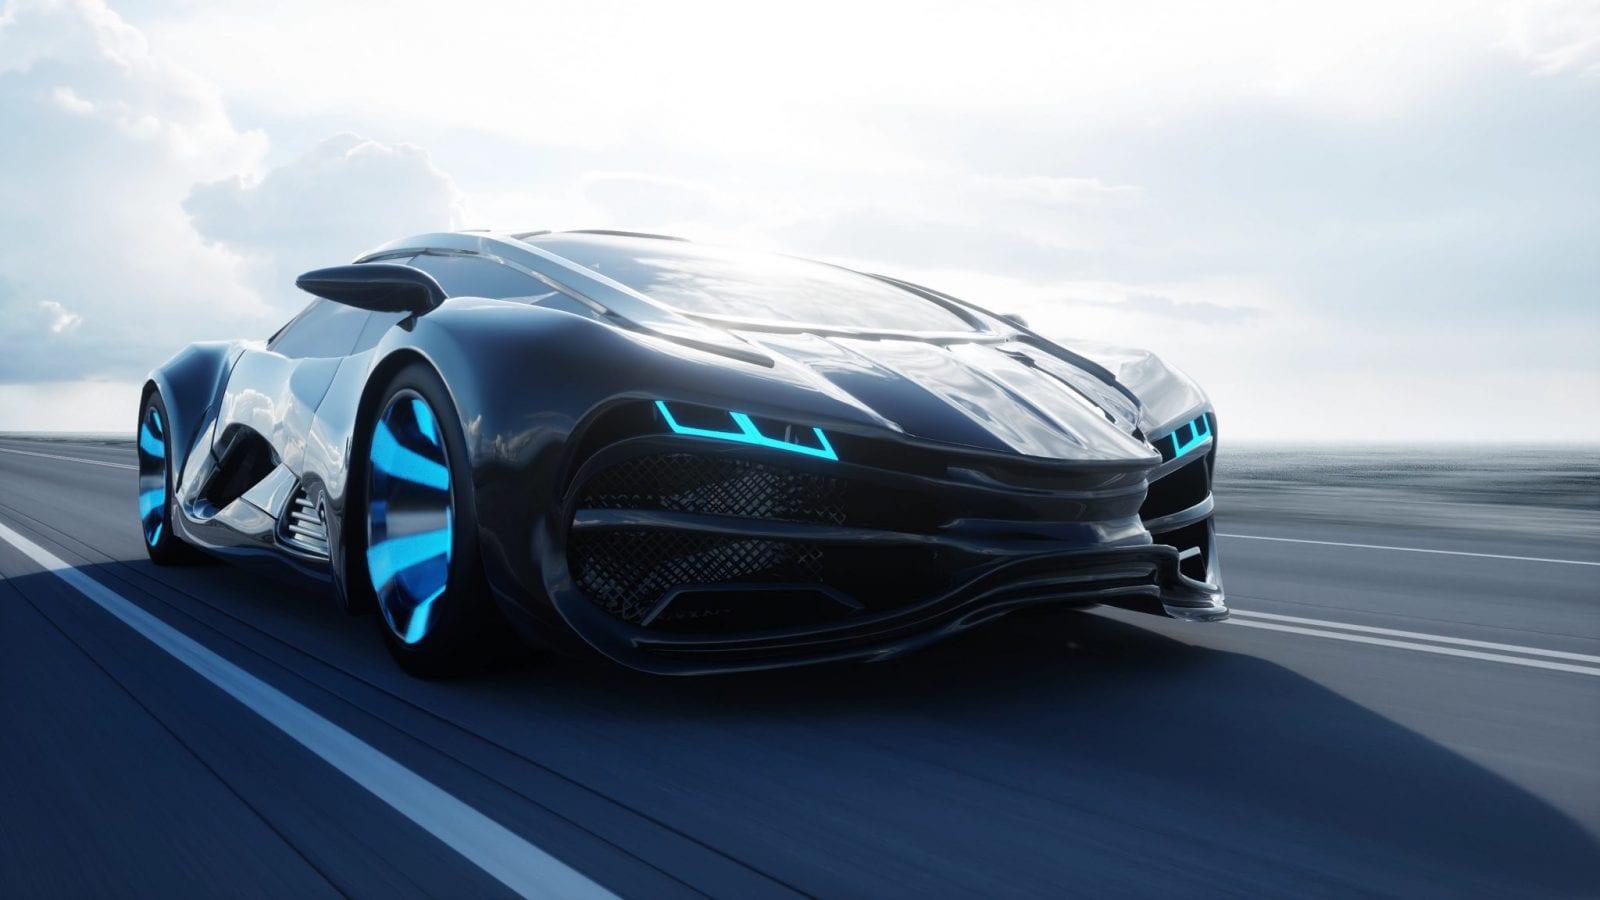 Cars of The Future | UK Car Finance